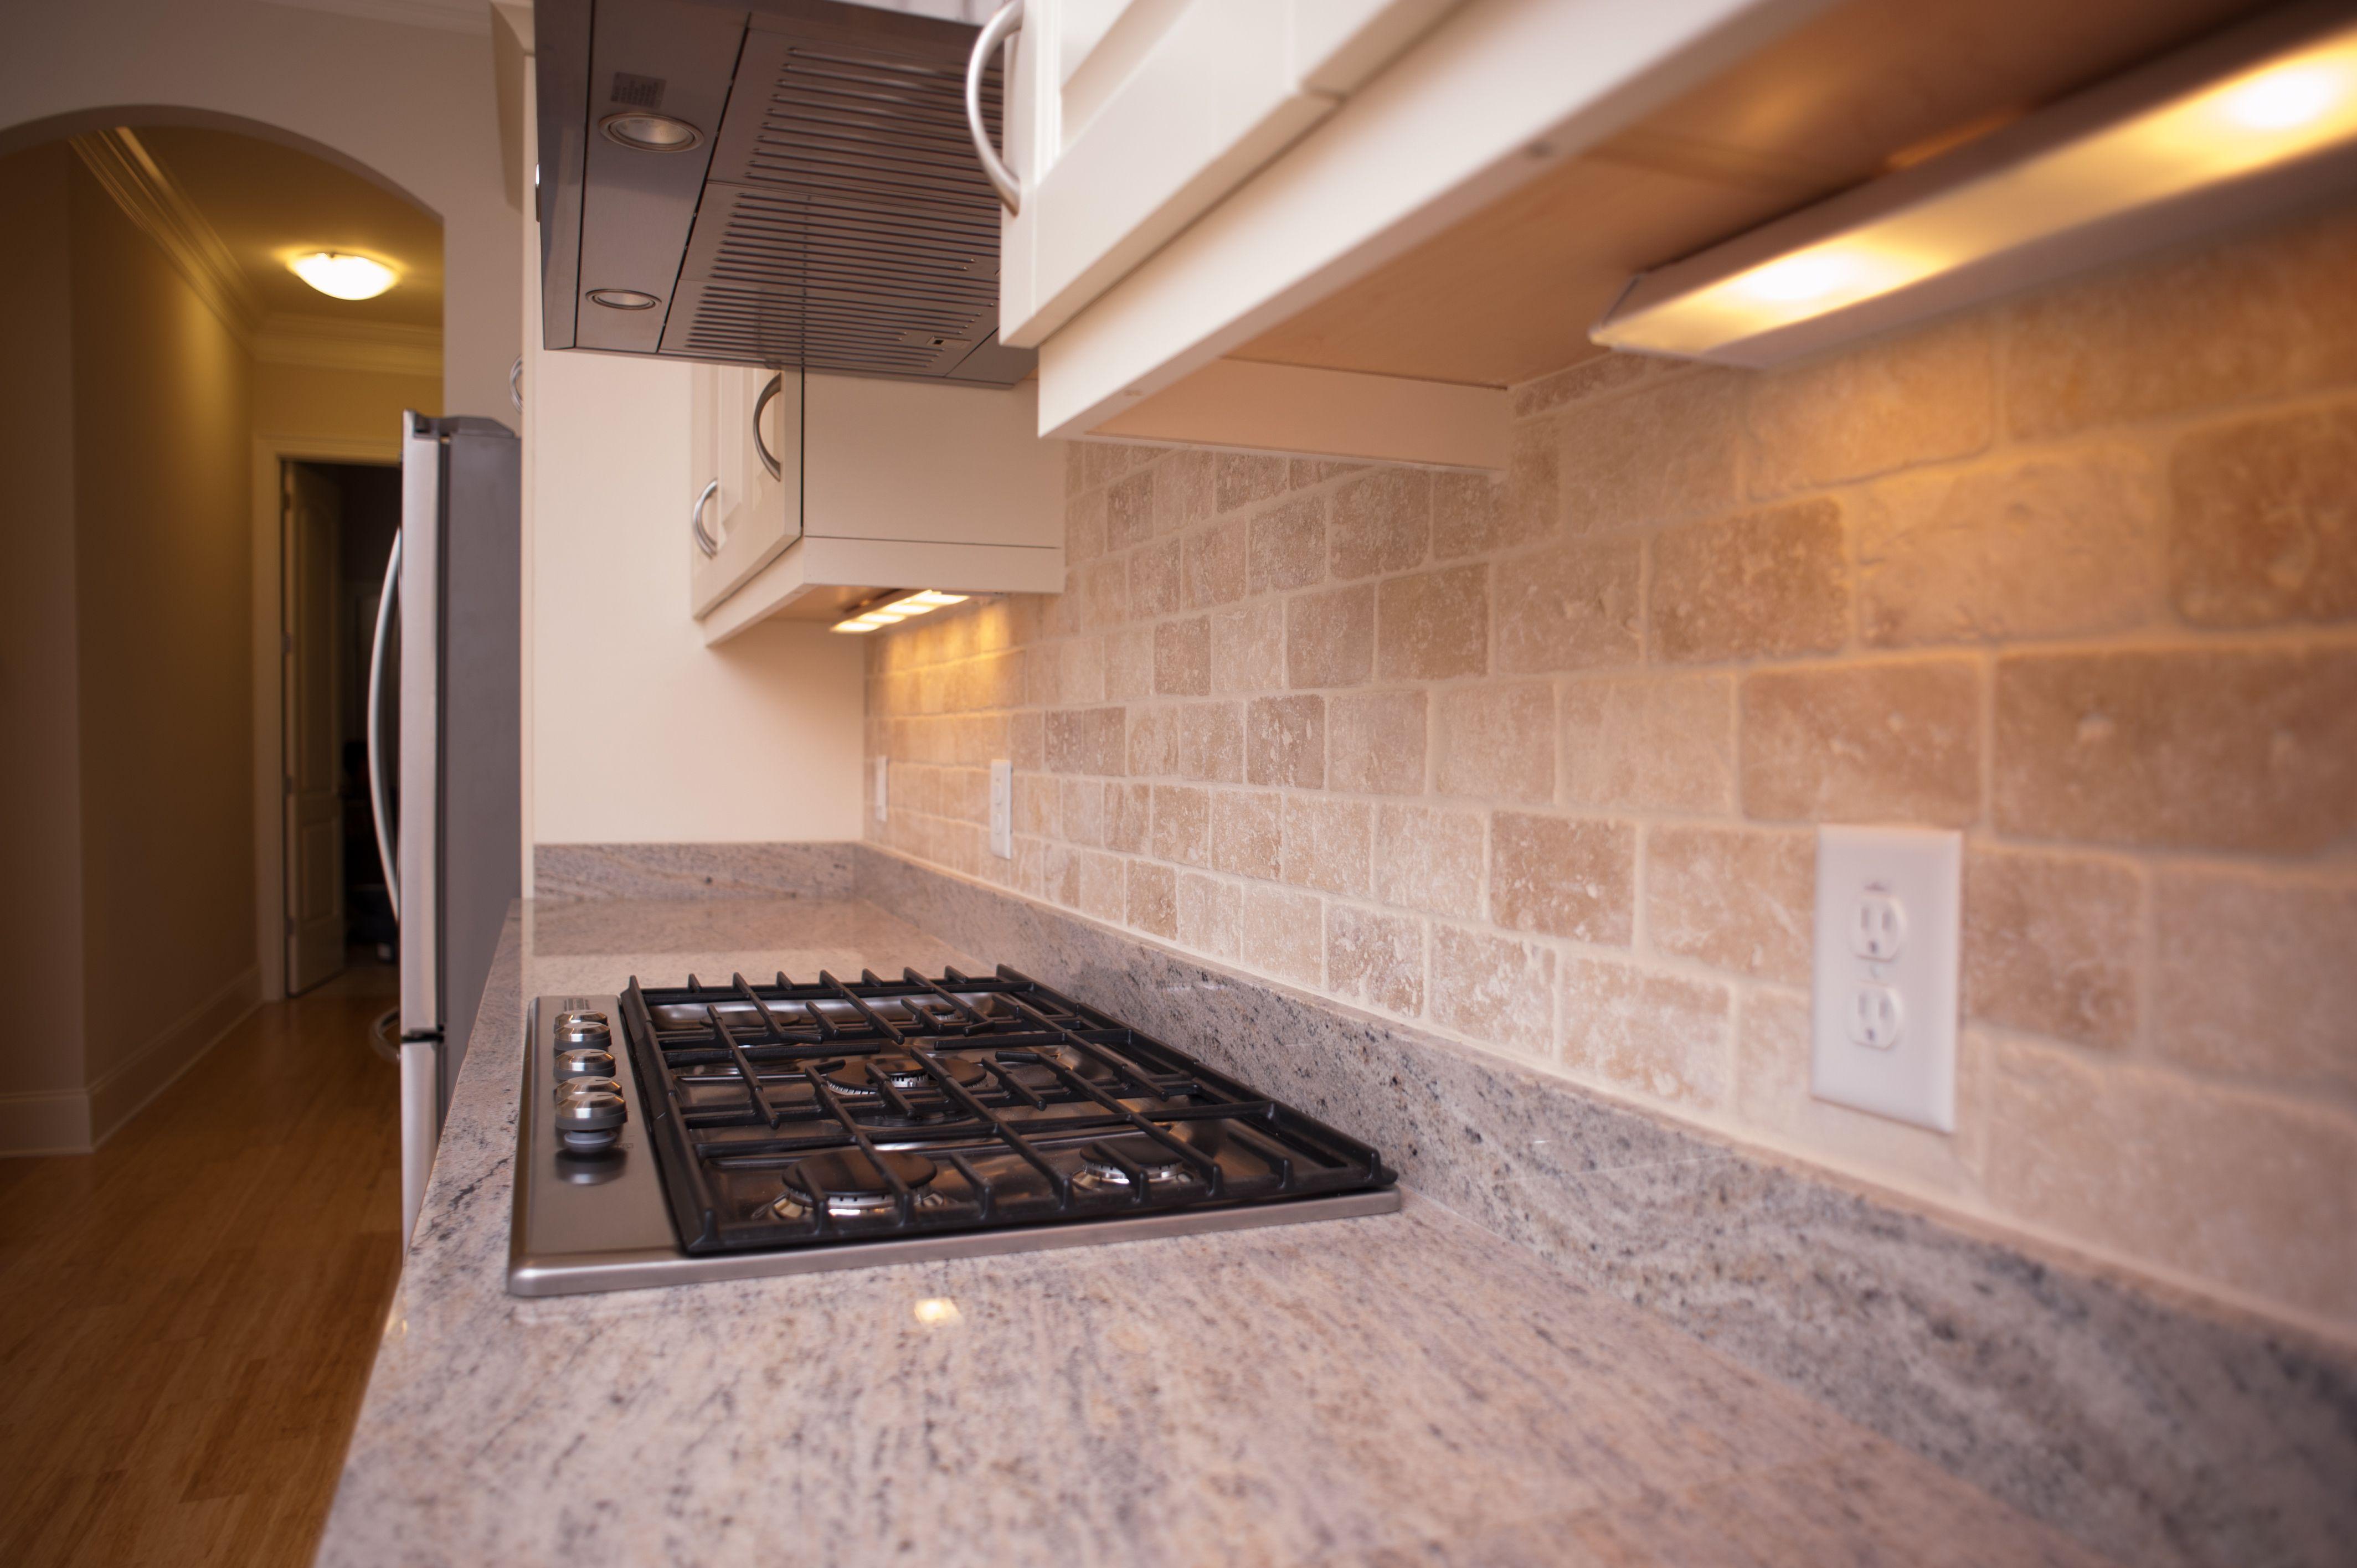 Granite Counter Tops Tile Back Splash Built In Gas Stove